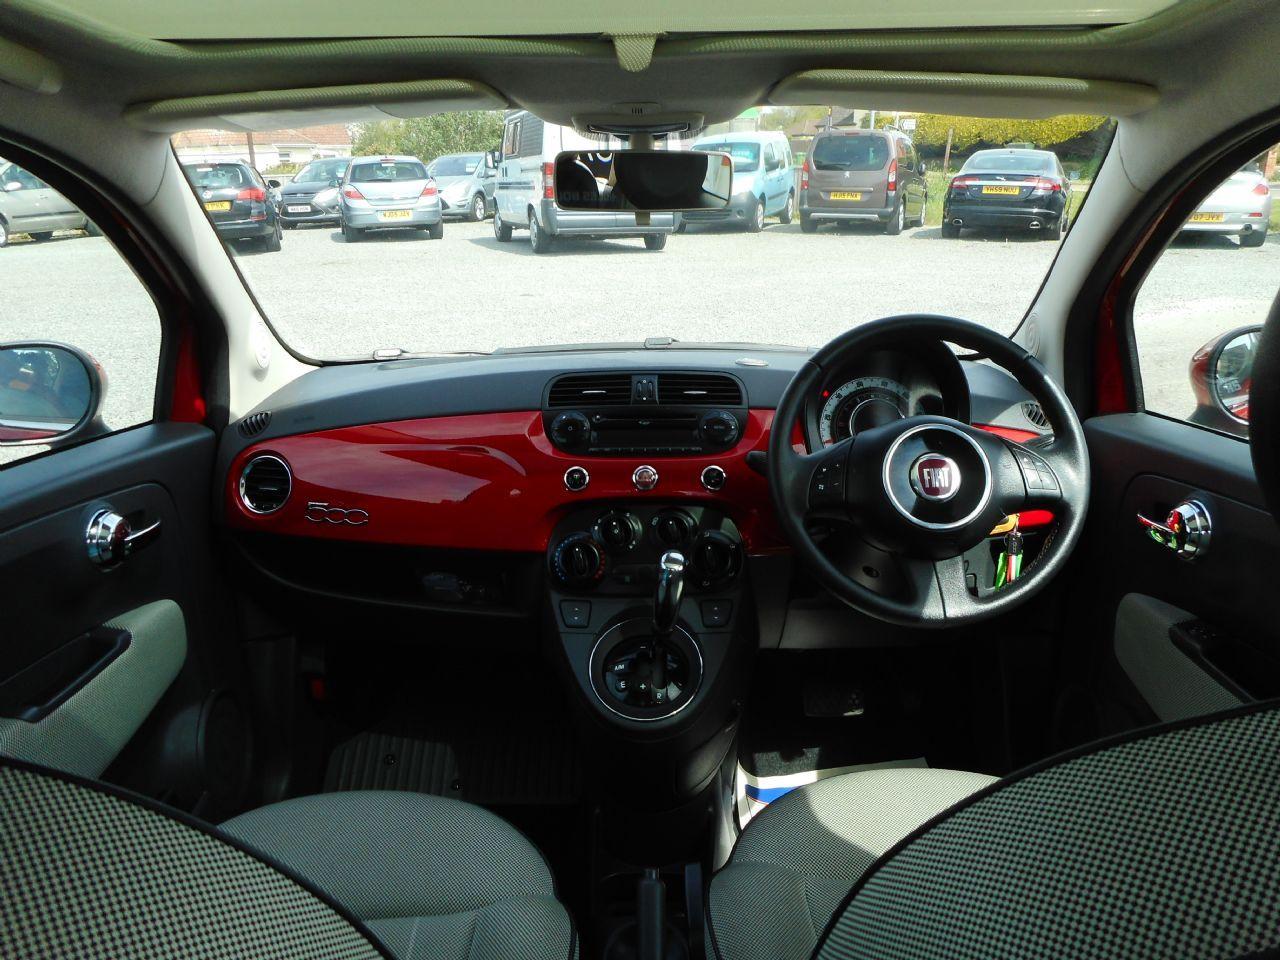 FIAT 500 1.2i Lounge S/S AUTO (2011) - Picture 16